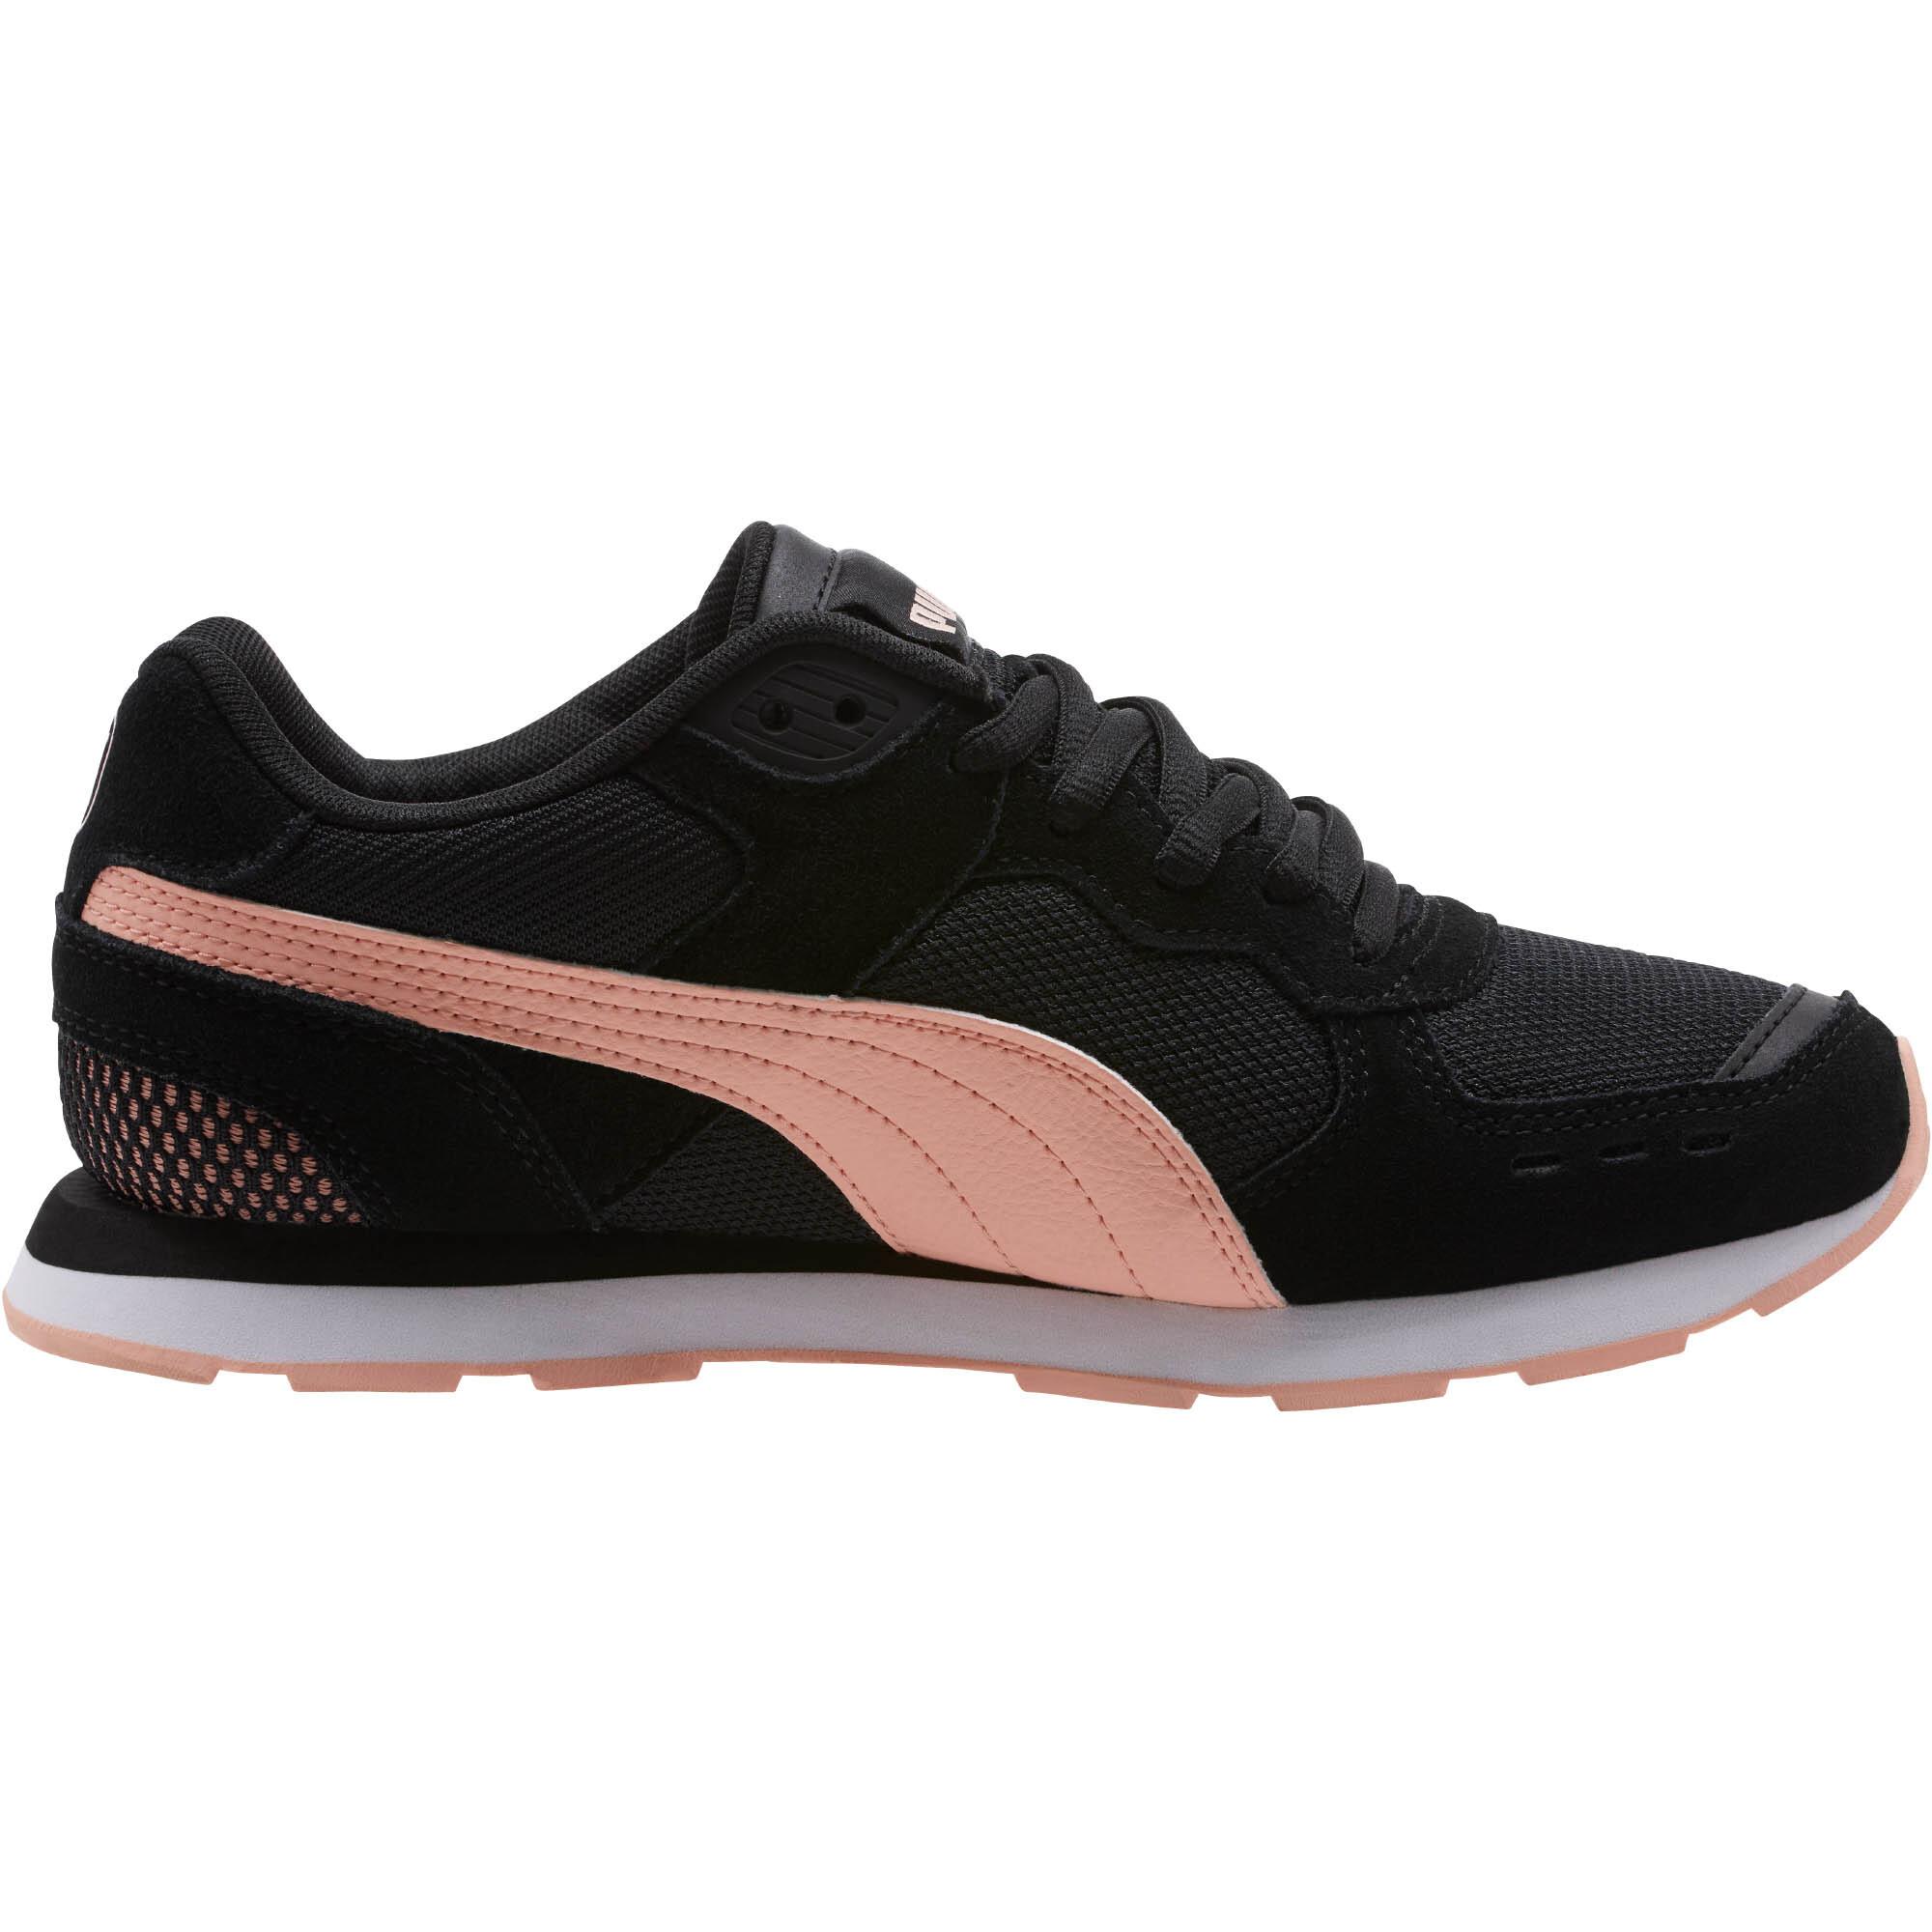 PUMA-Vista-Women-s-Sneakers-Women-Shoe-Basics thumbnail 10